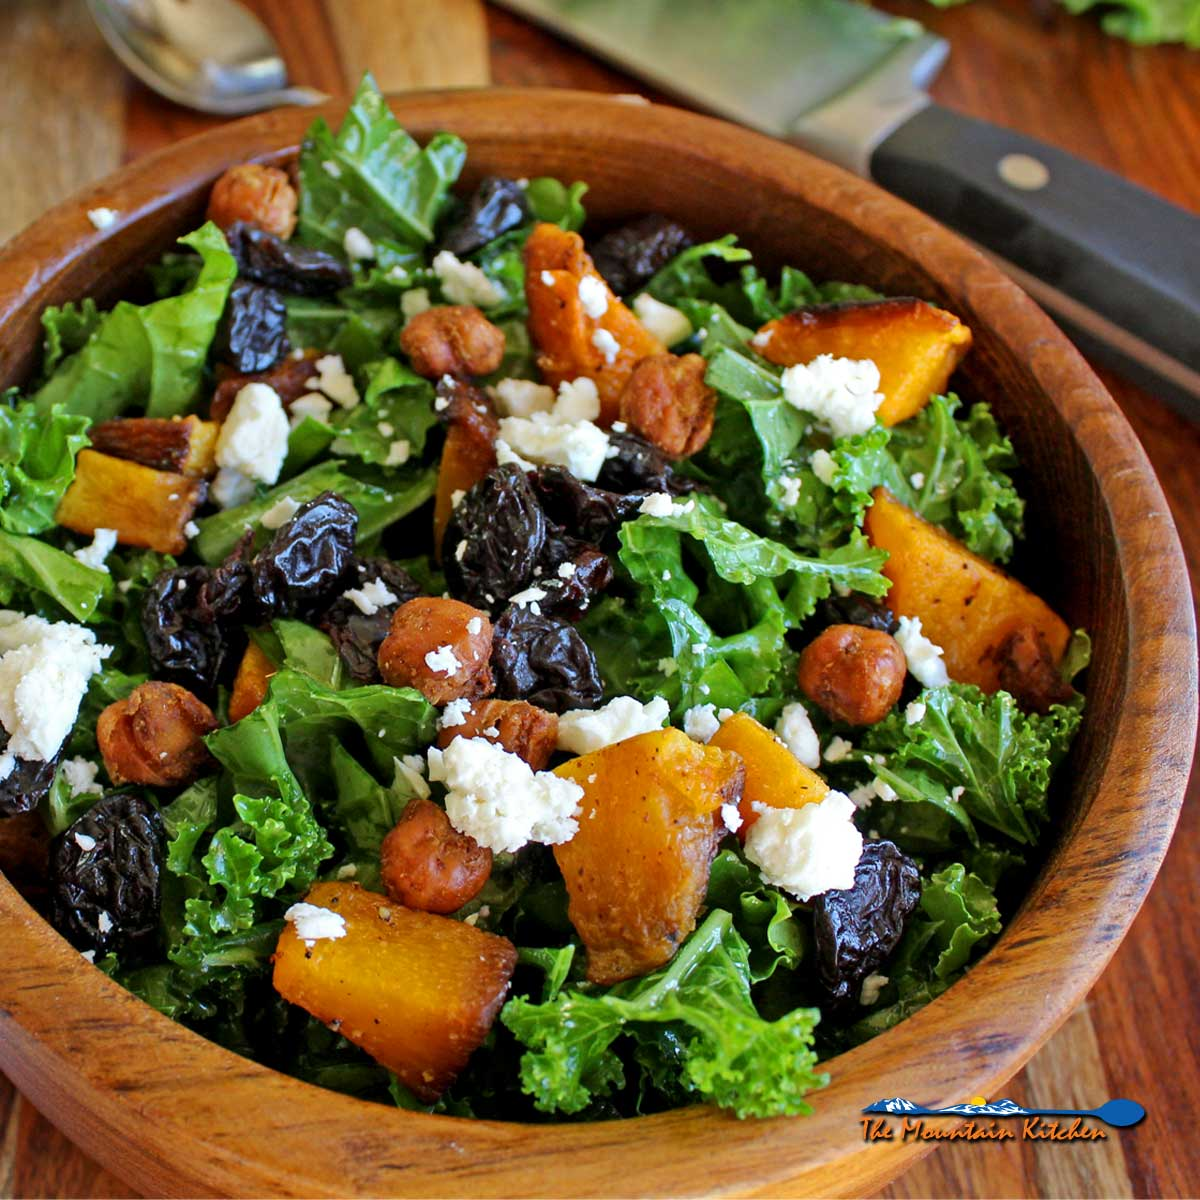 Roasted Butternut Squash Kale Salad {A Meatless Monday Recipe